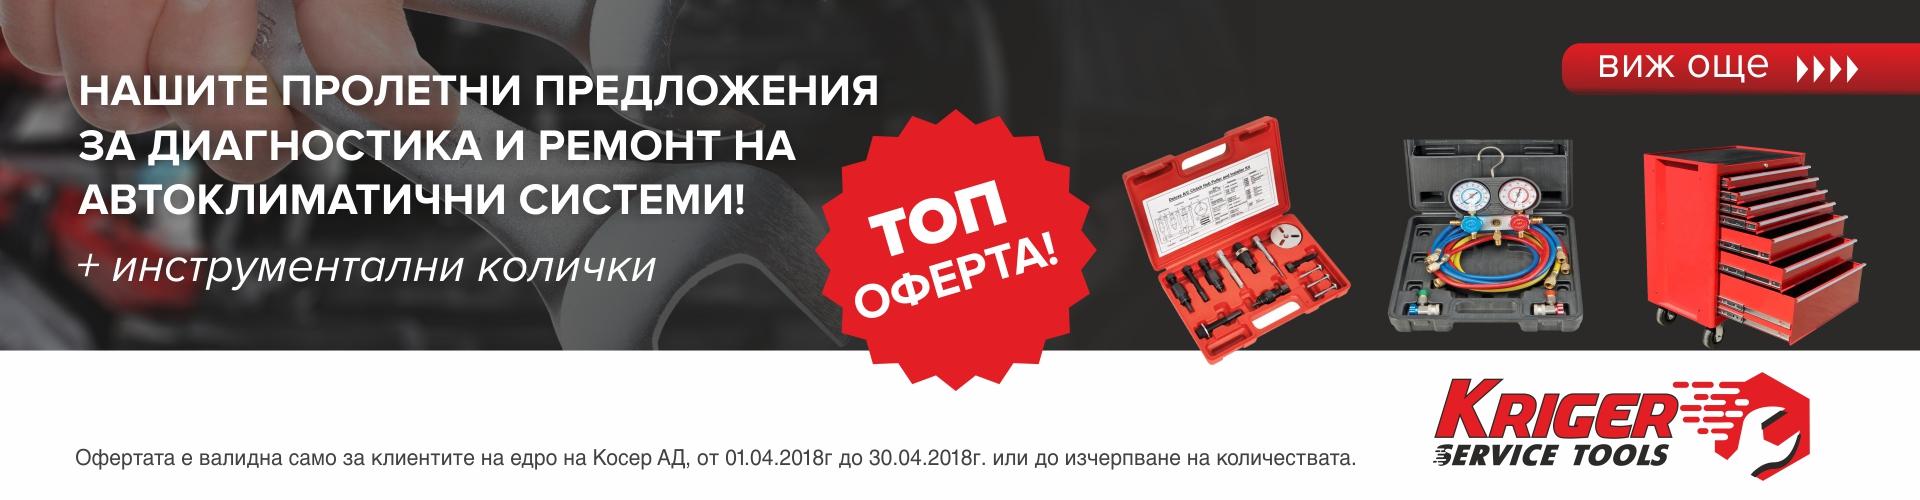 kriger_tools_april_2018_banner.jpg